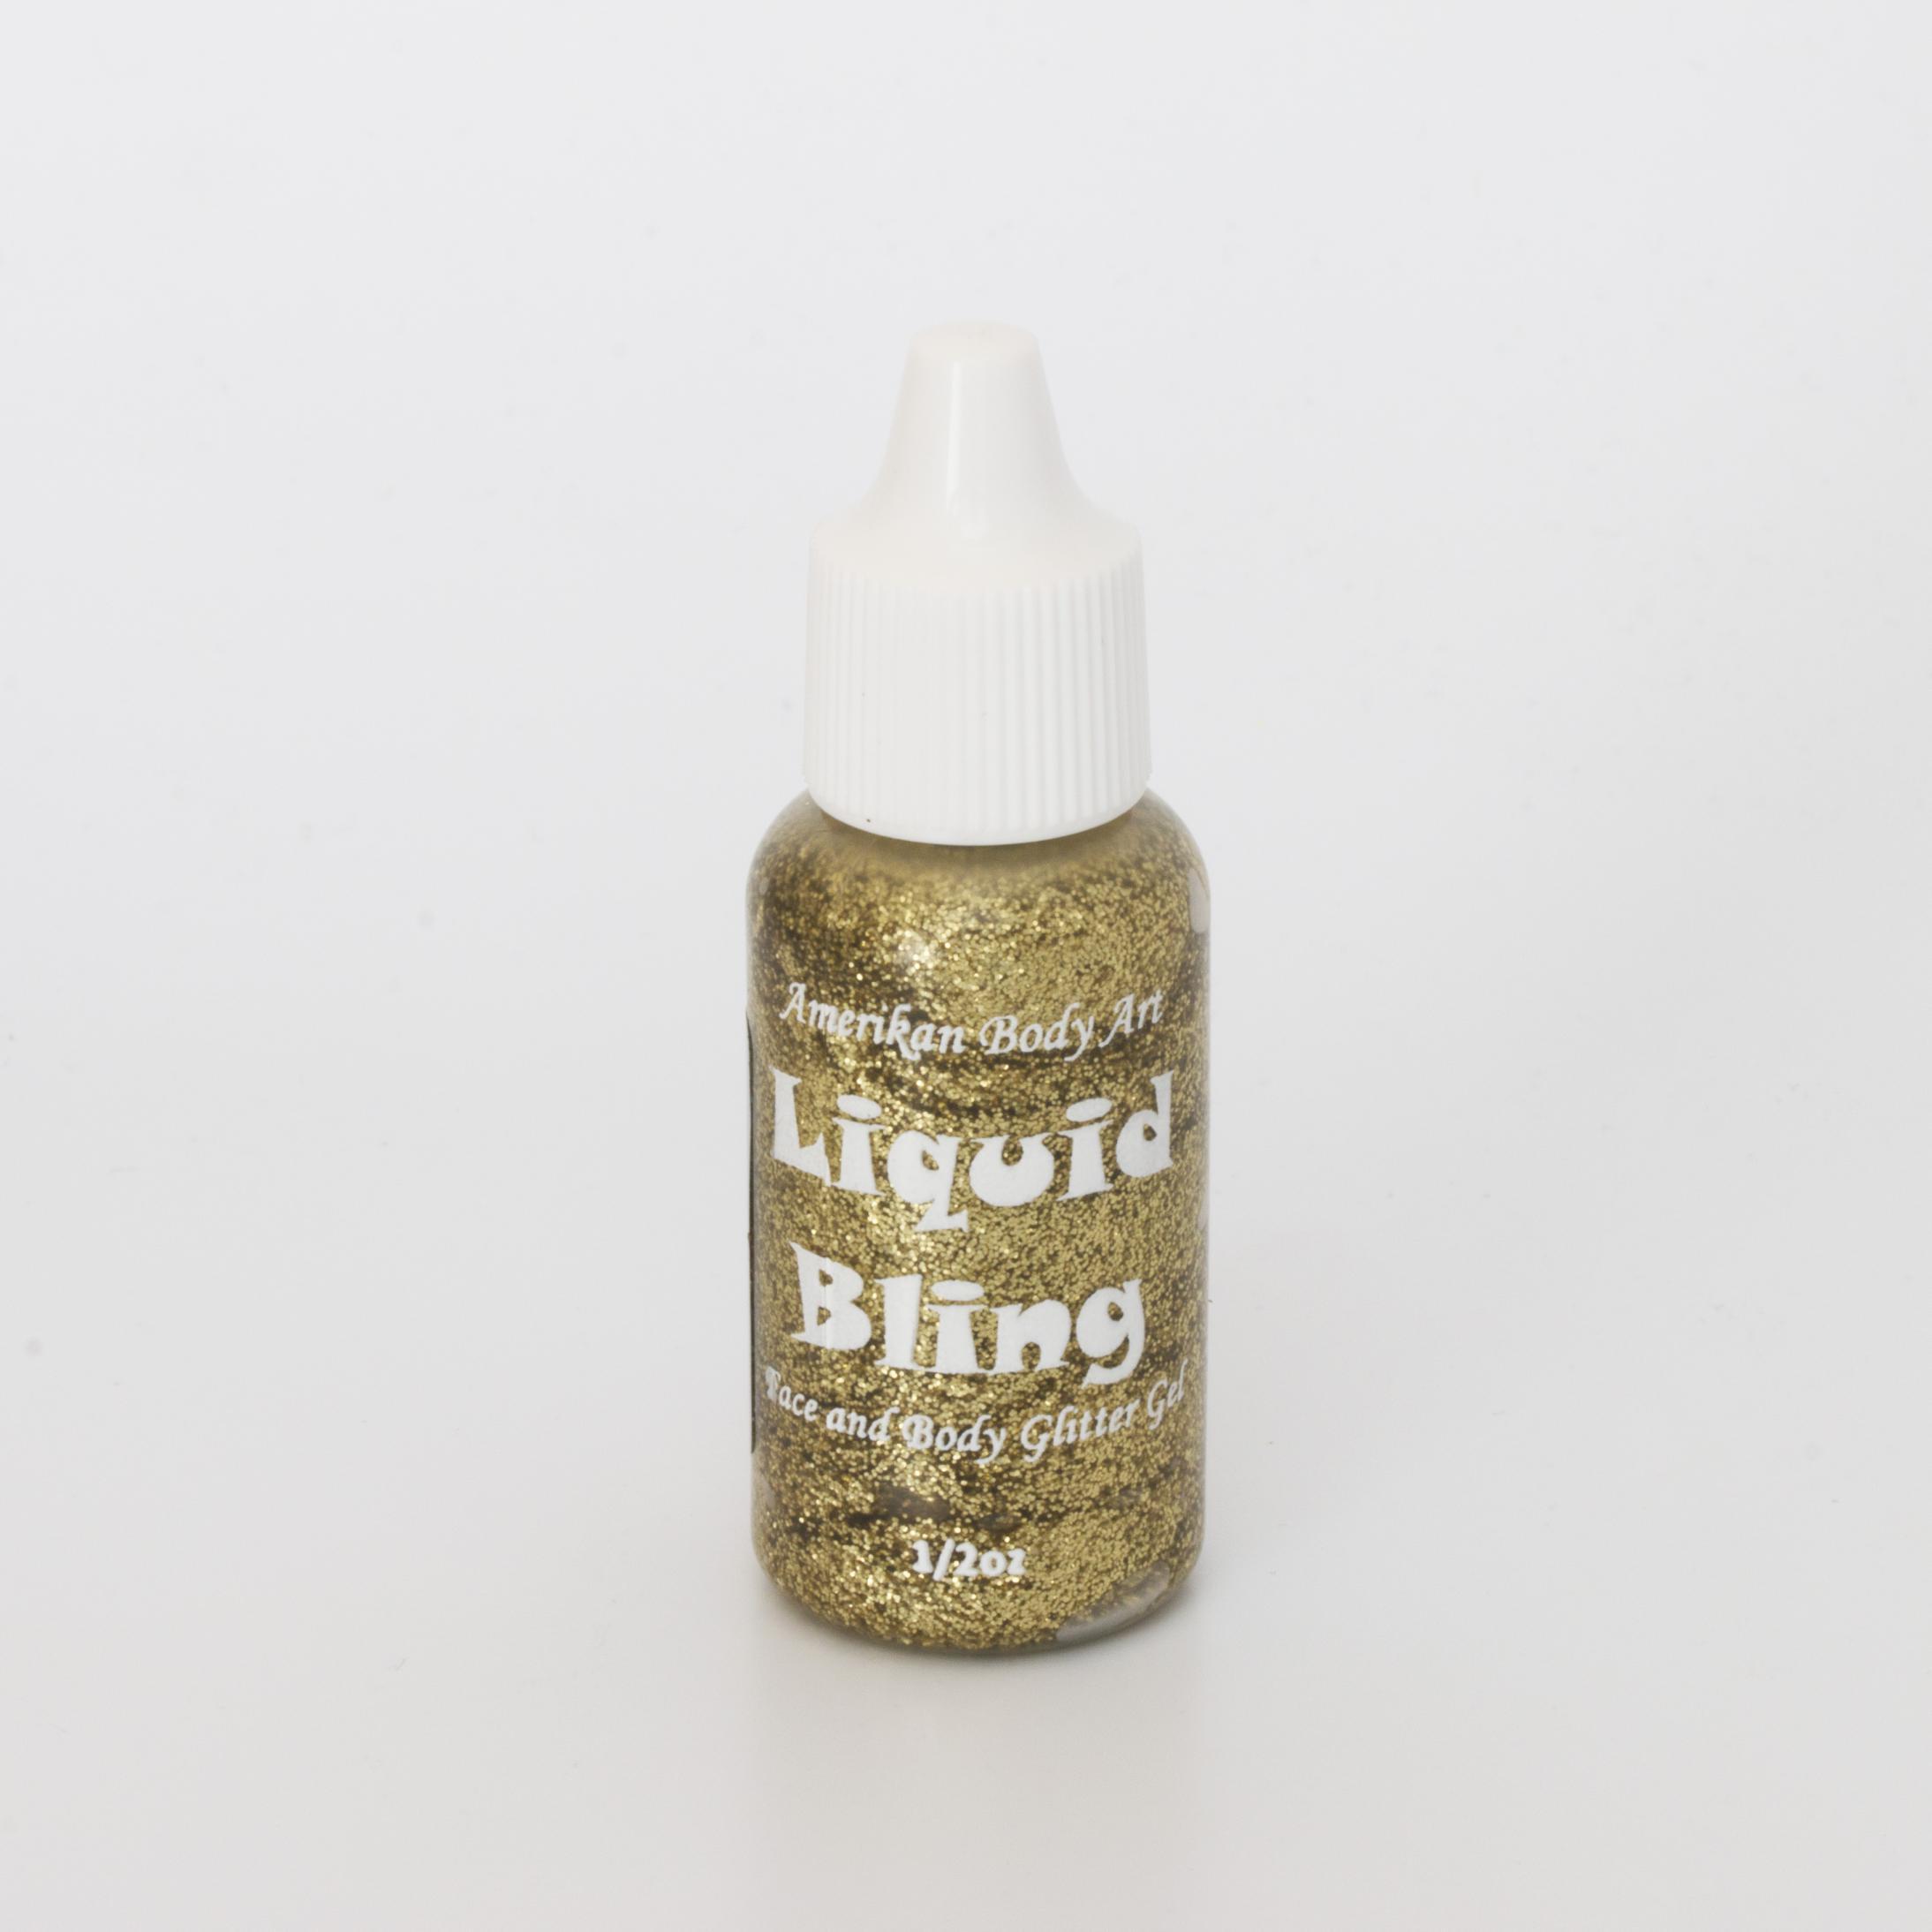 Brilliant Gold 1/2 oz Liquid Bling